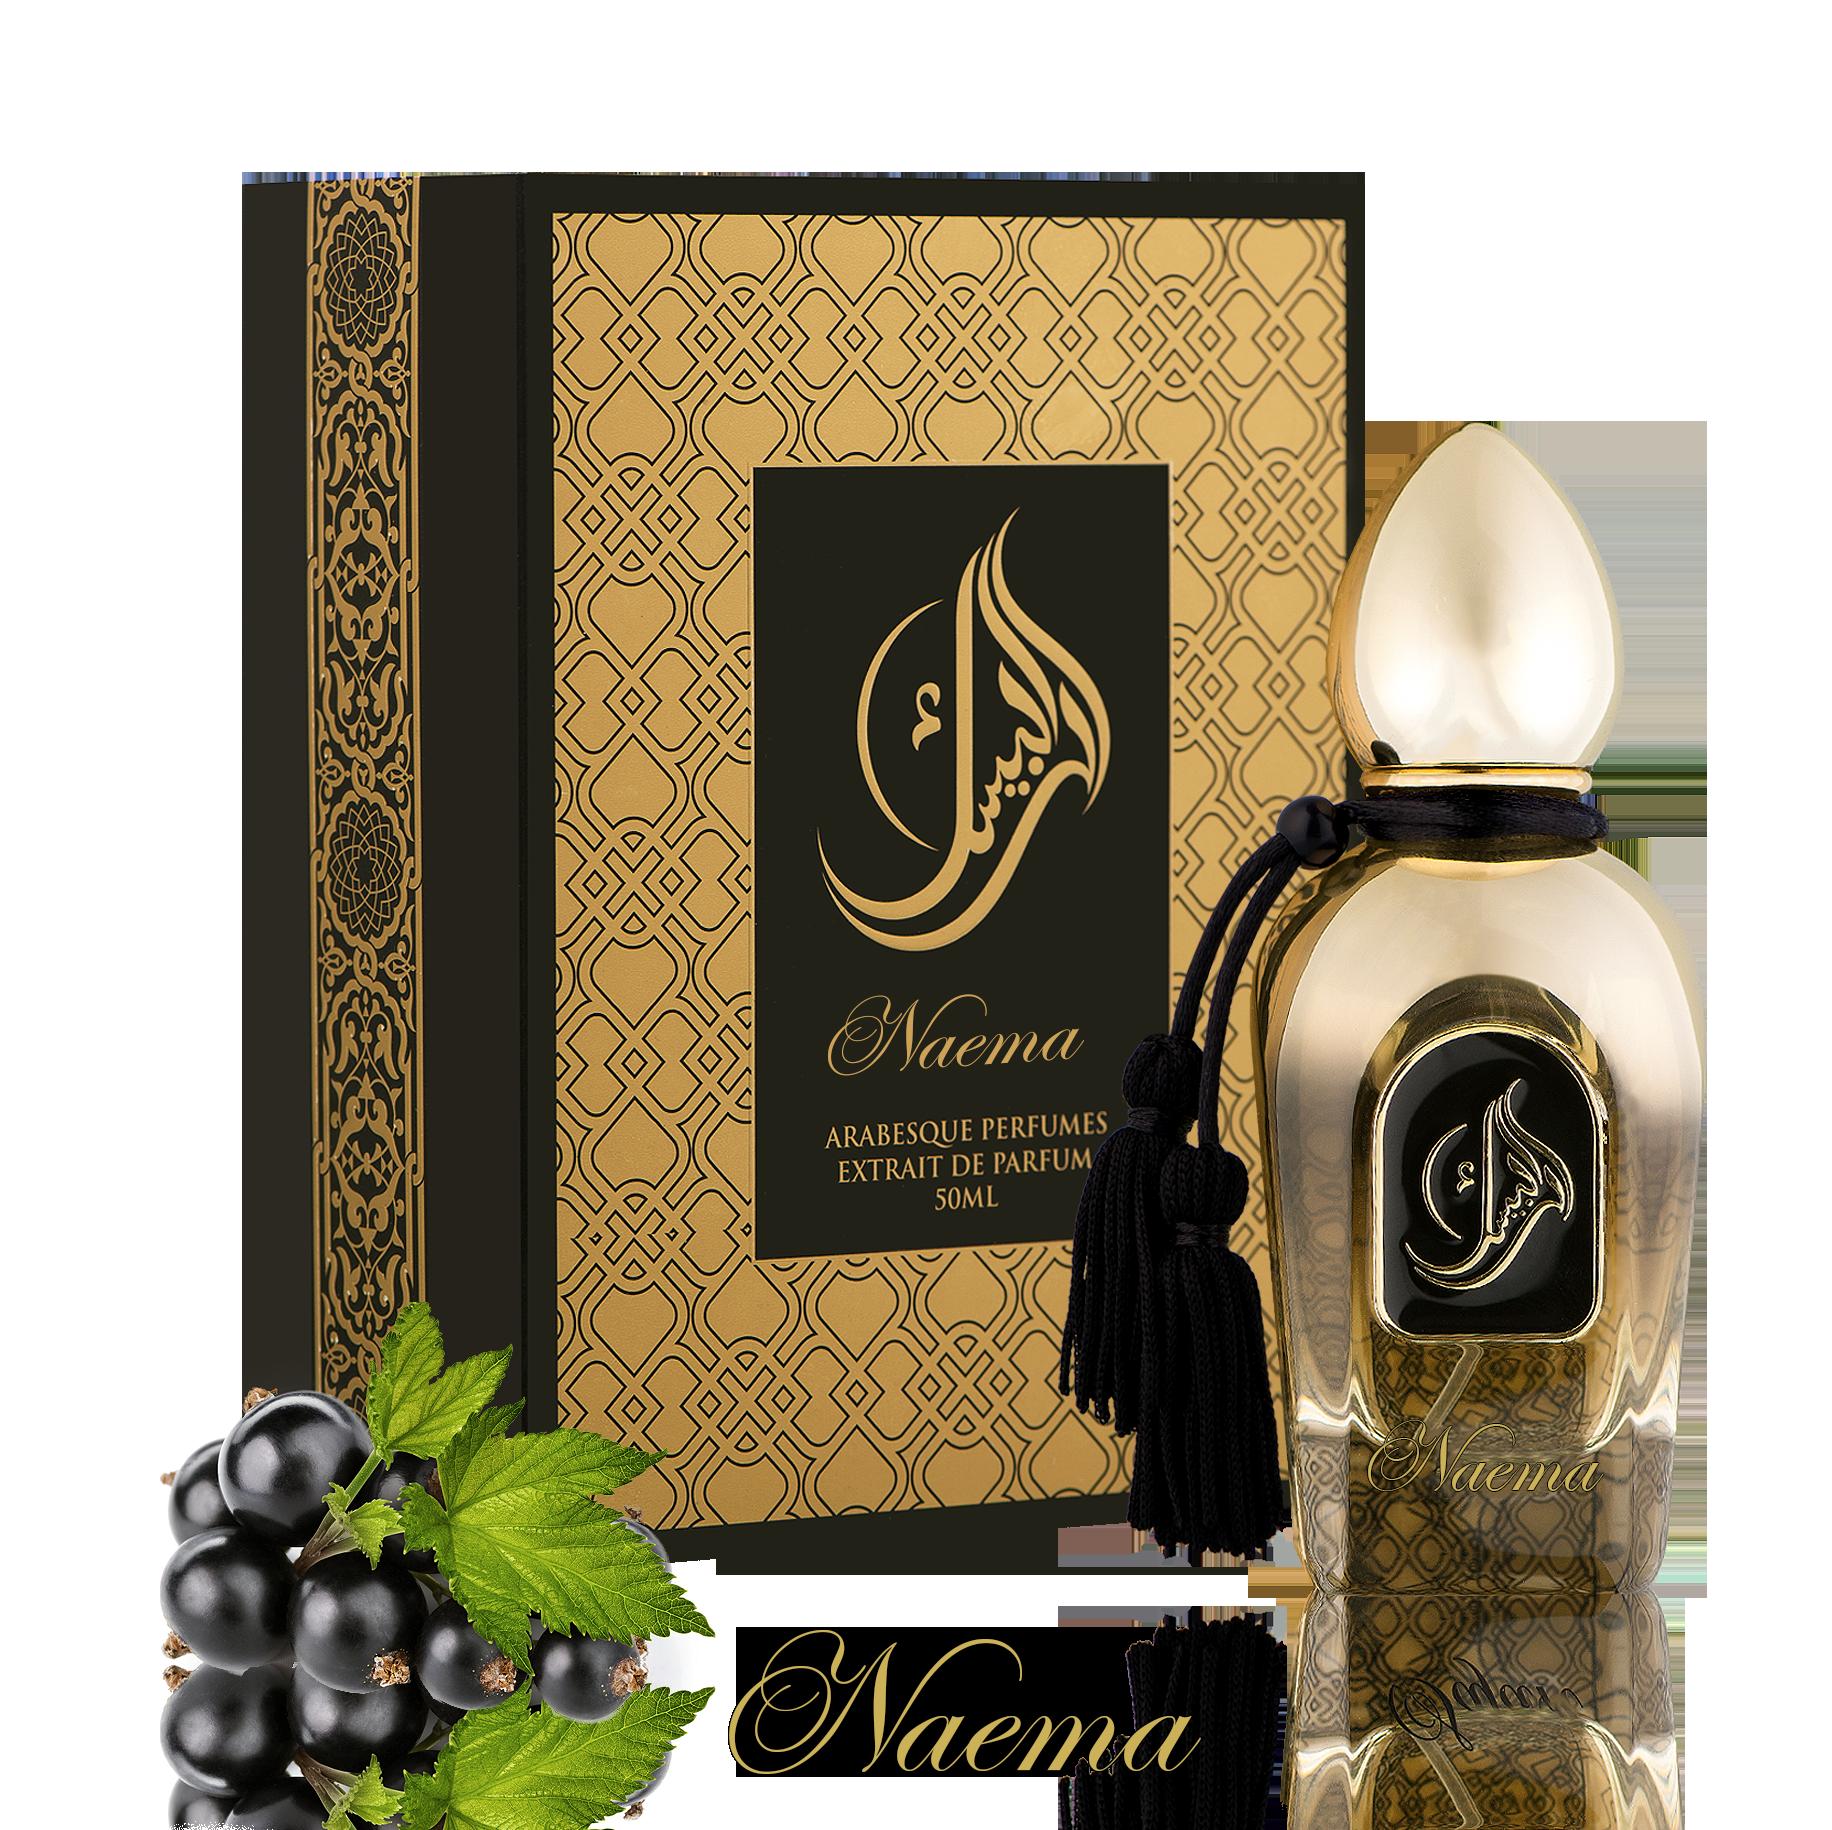 Arabesque Perfumes